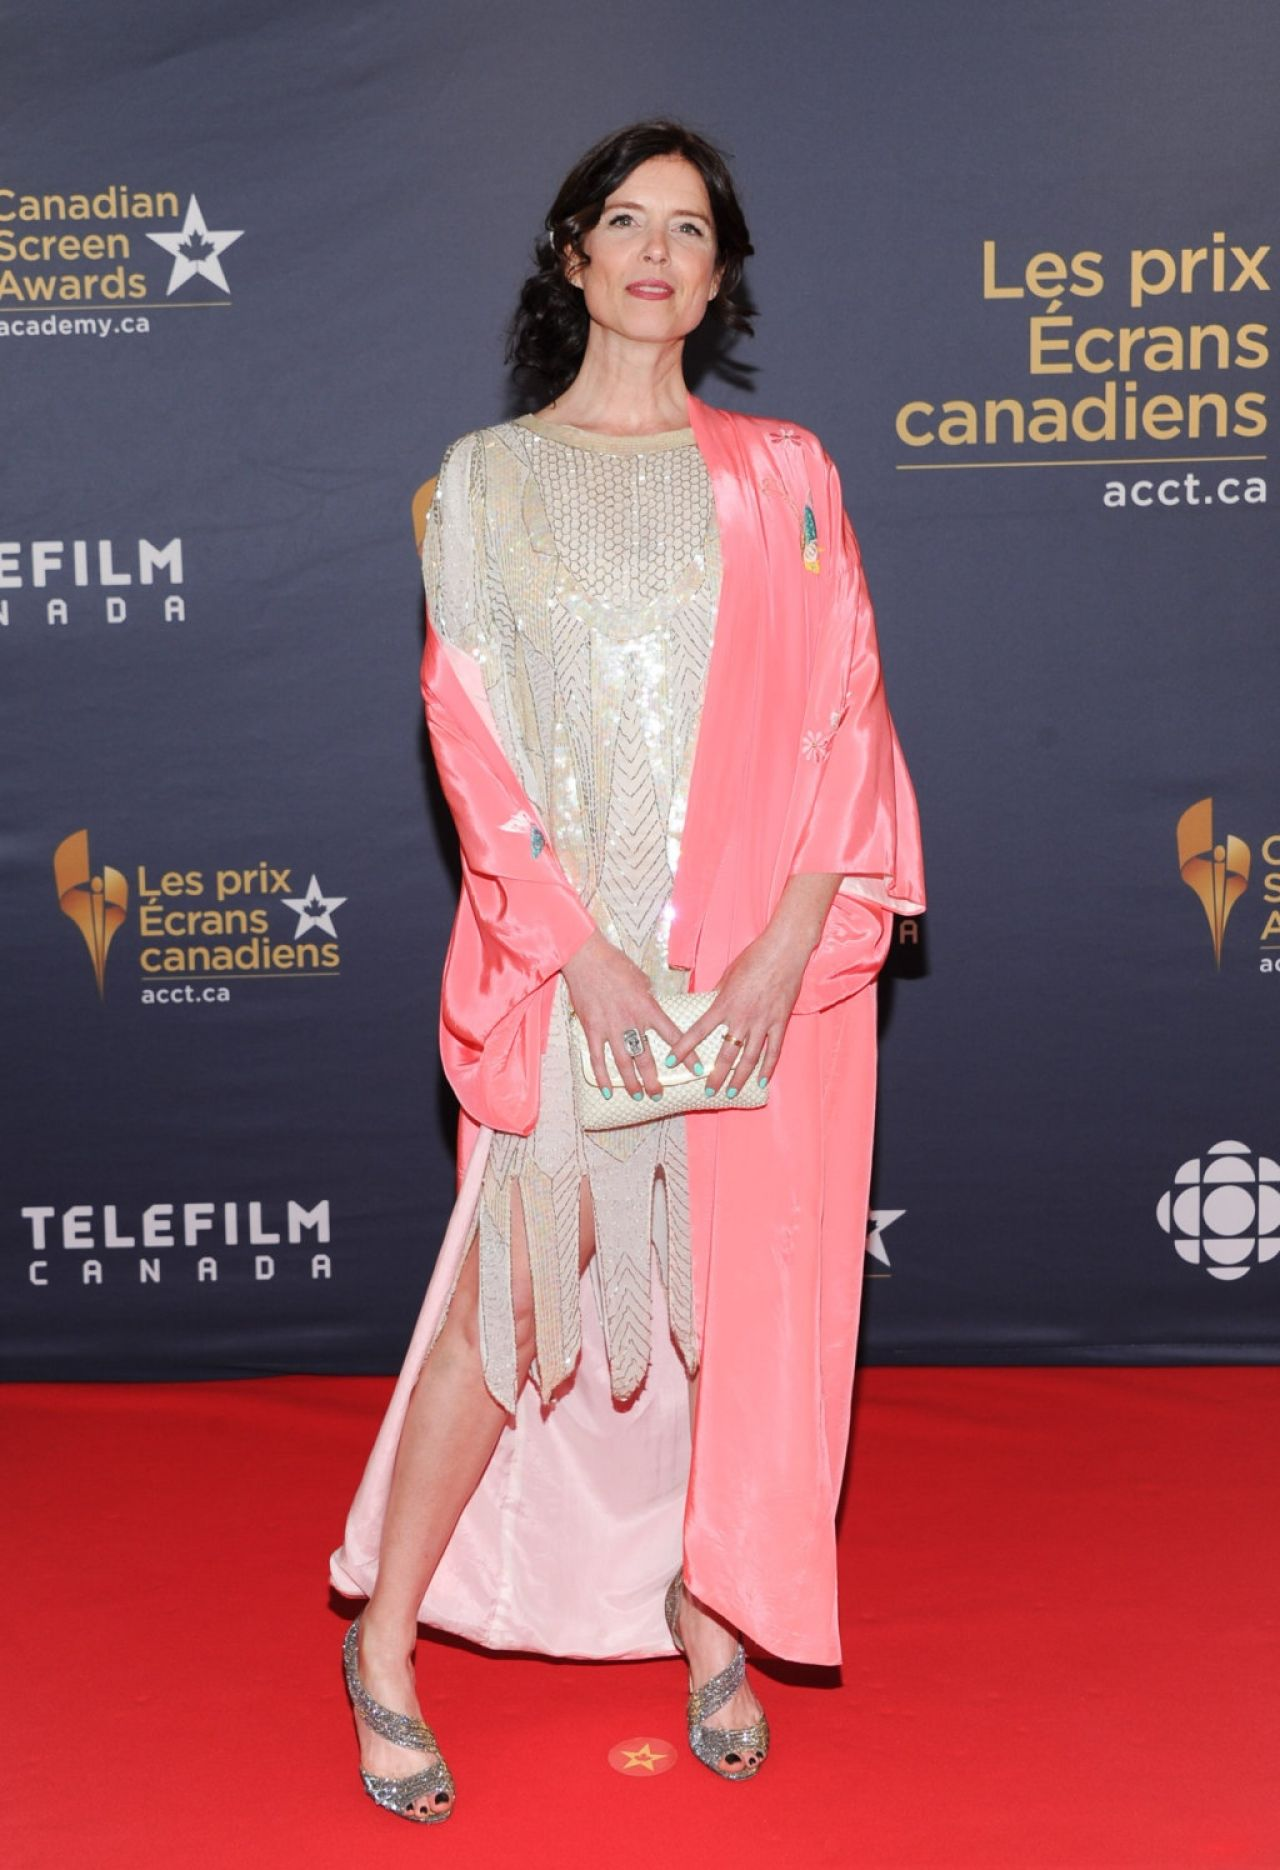 Torri Higginson - 2016 Canadian Screen Awards in Toronto